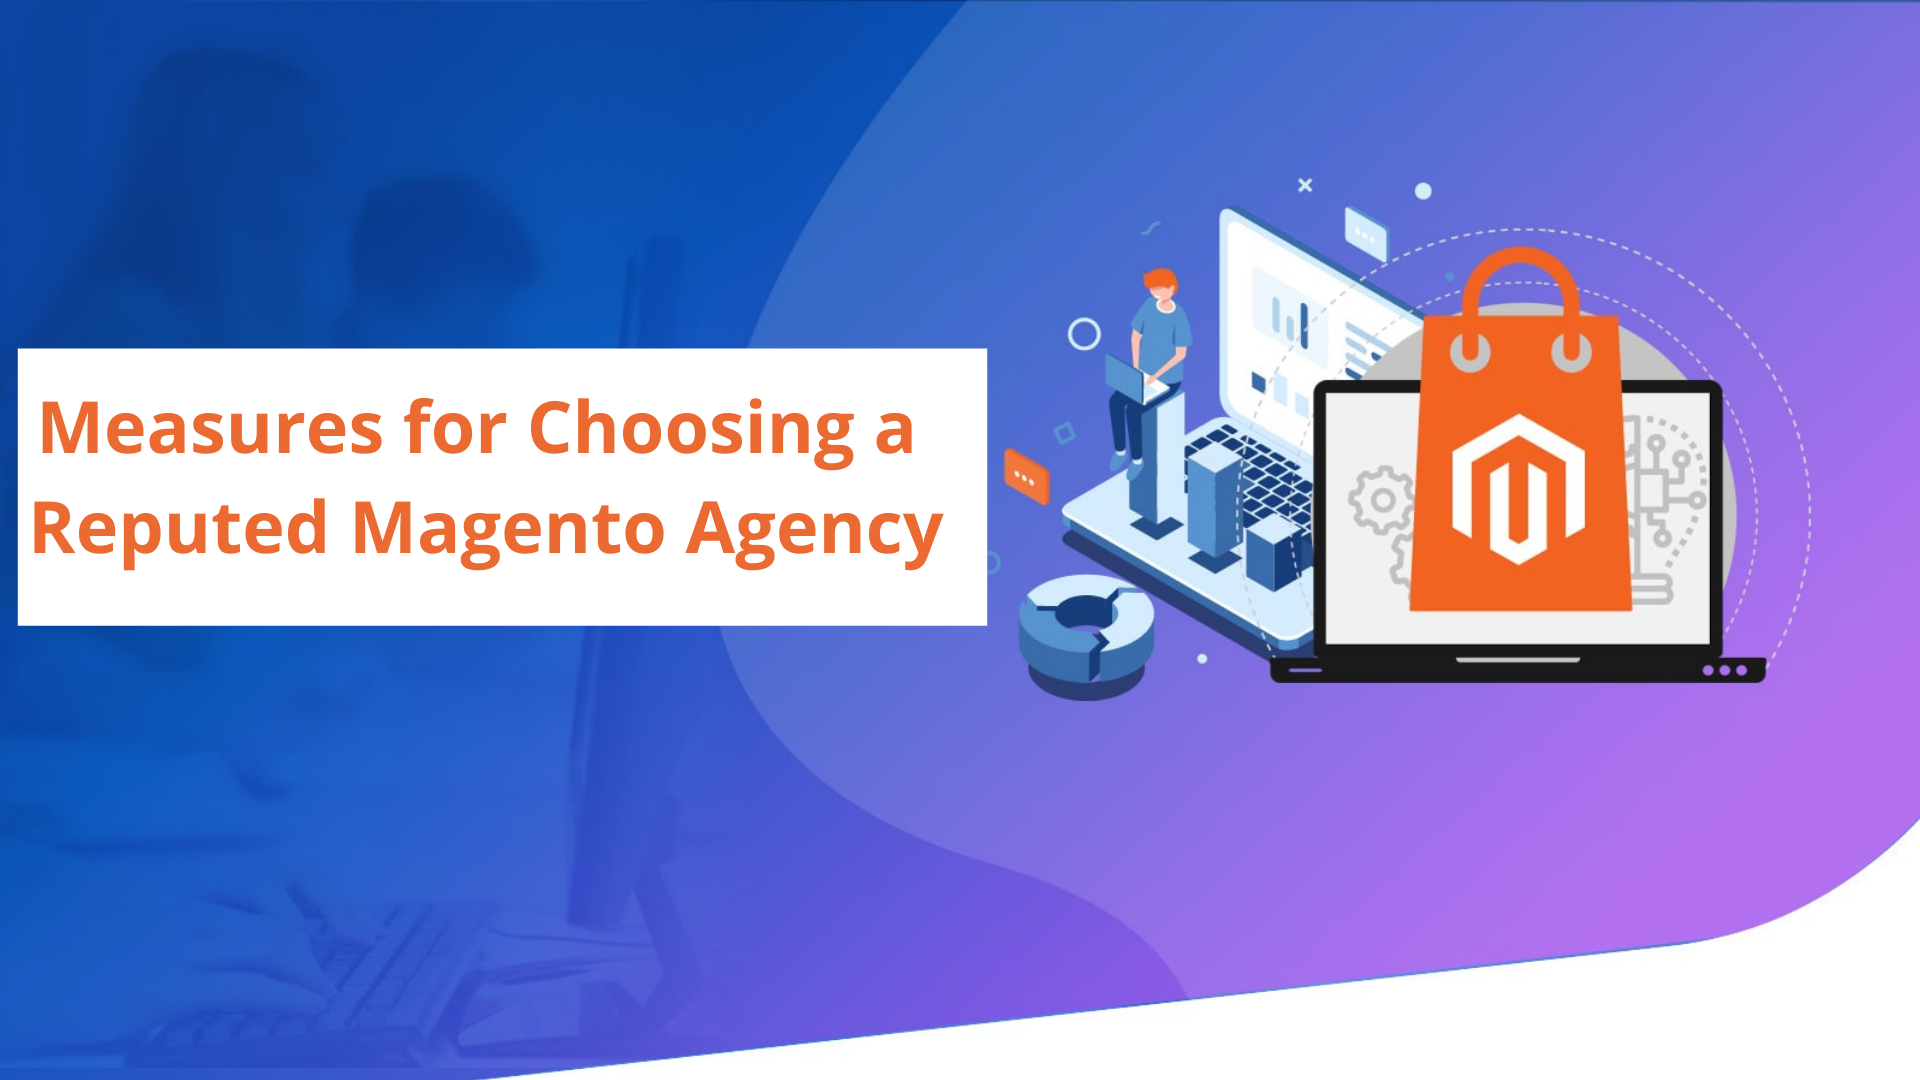 Choosing a Magento Agency